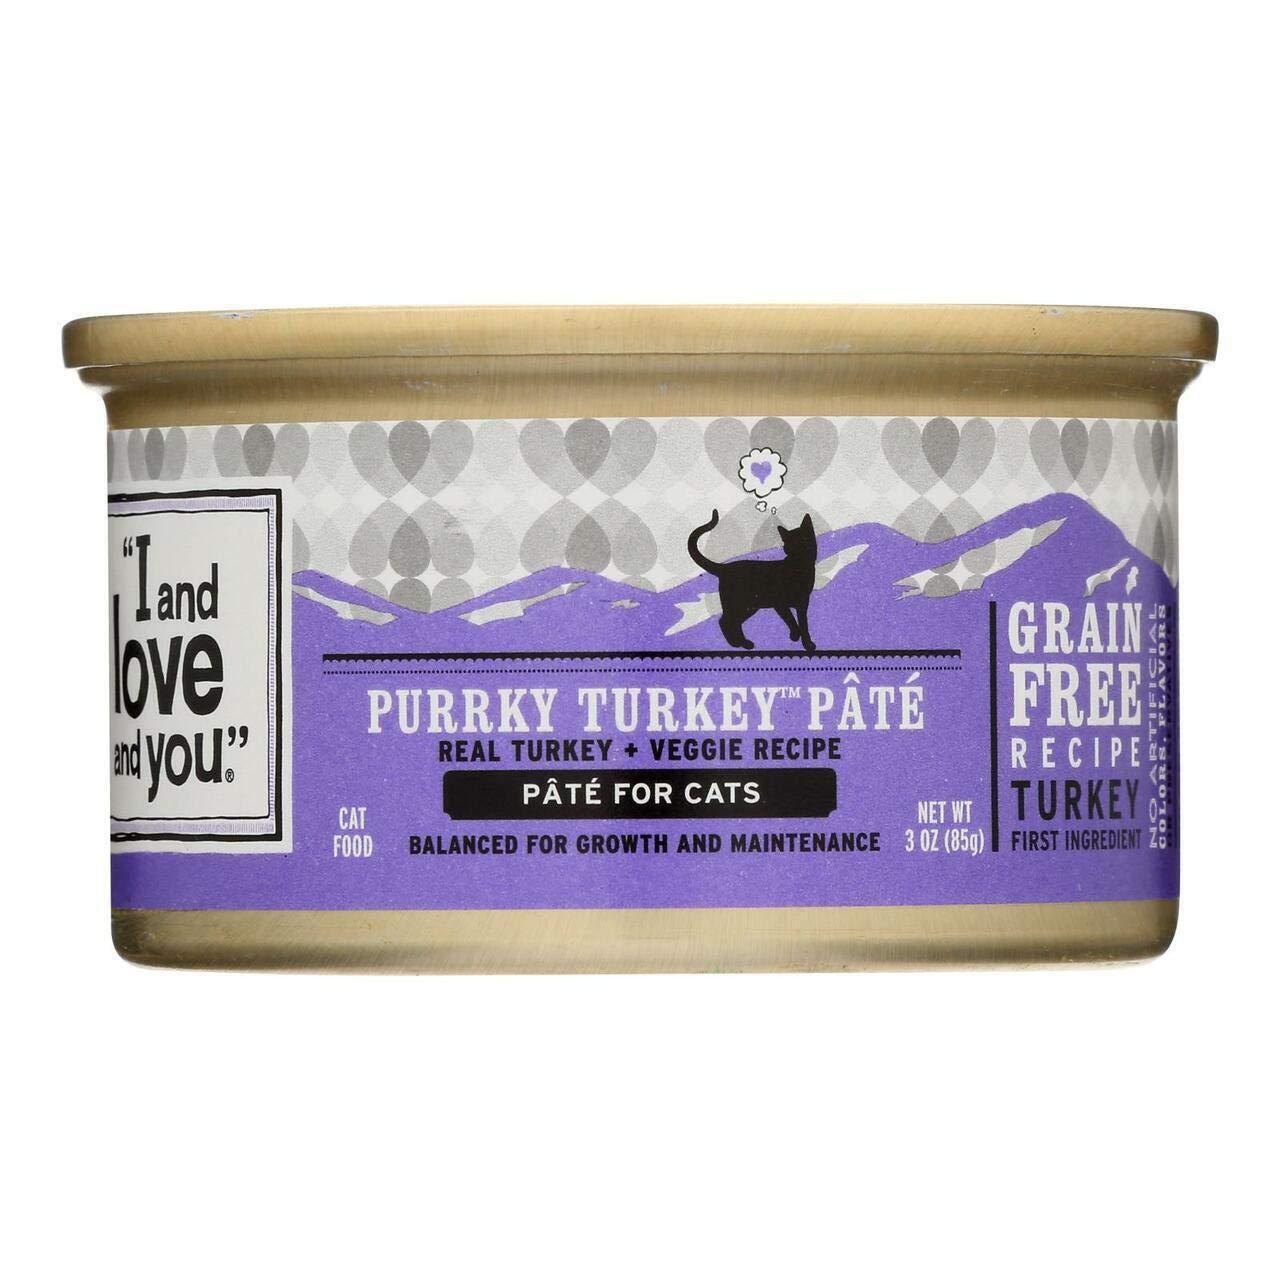 I&Love&You Cat Food Porky Try Pa, 3 oz